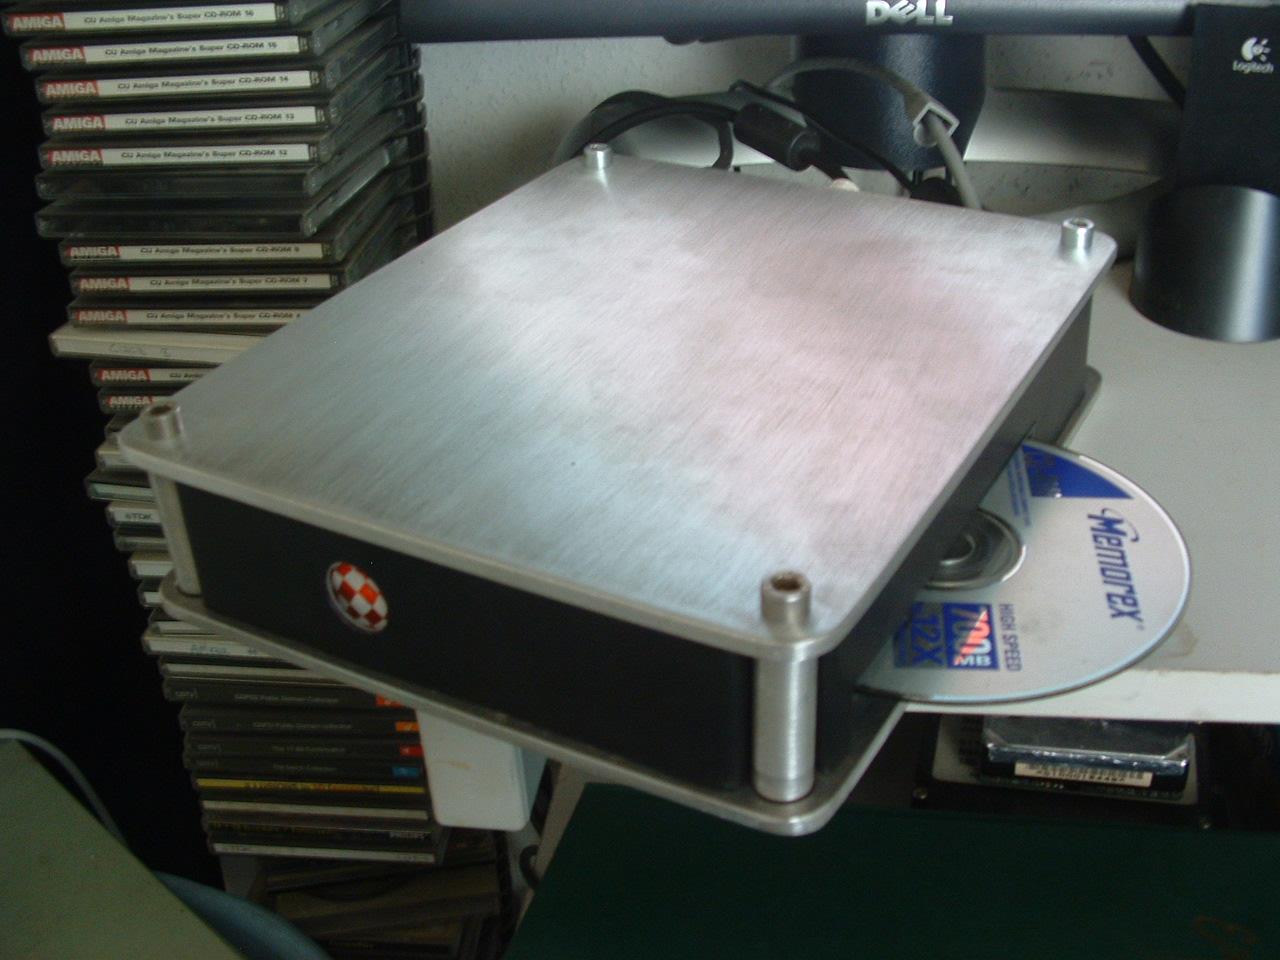 SAM case - 5